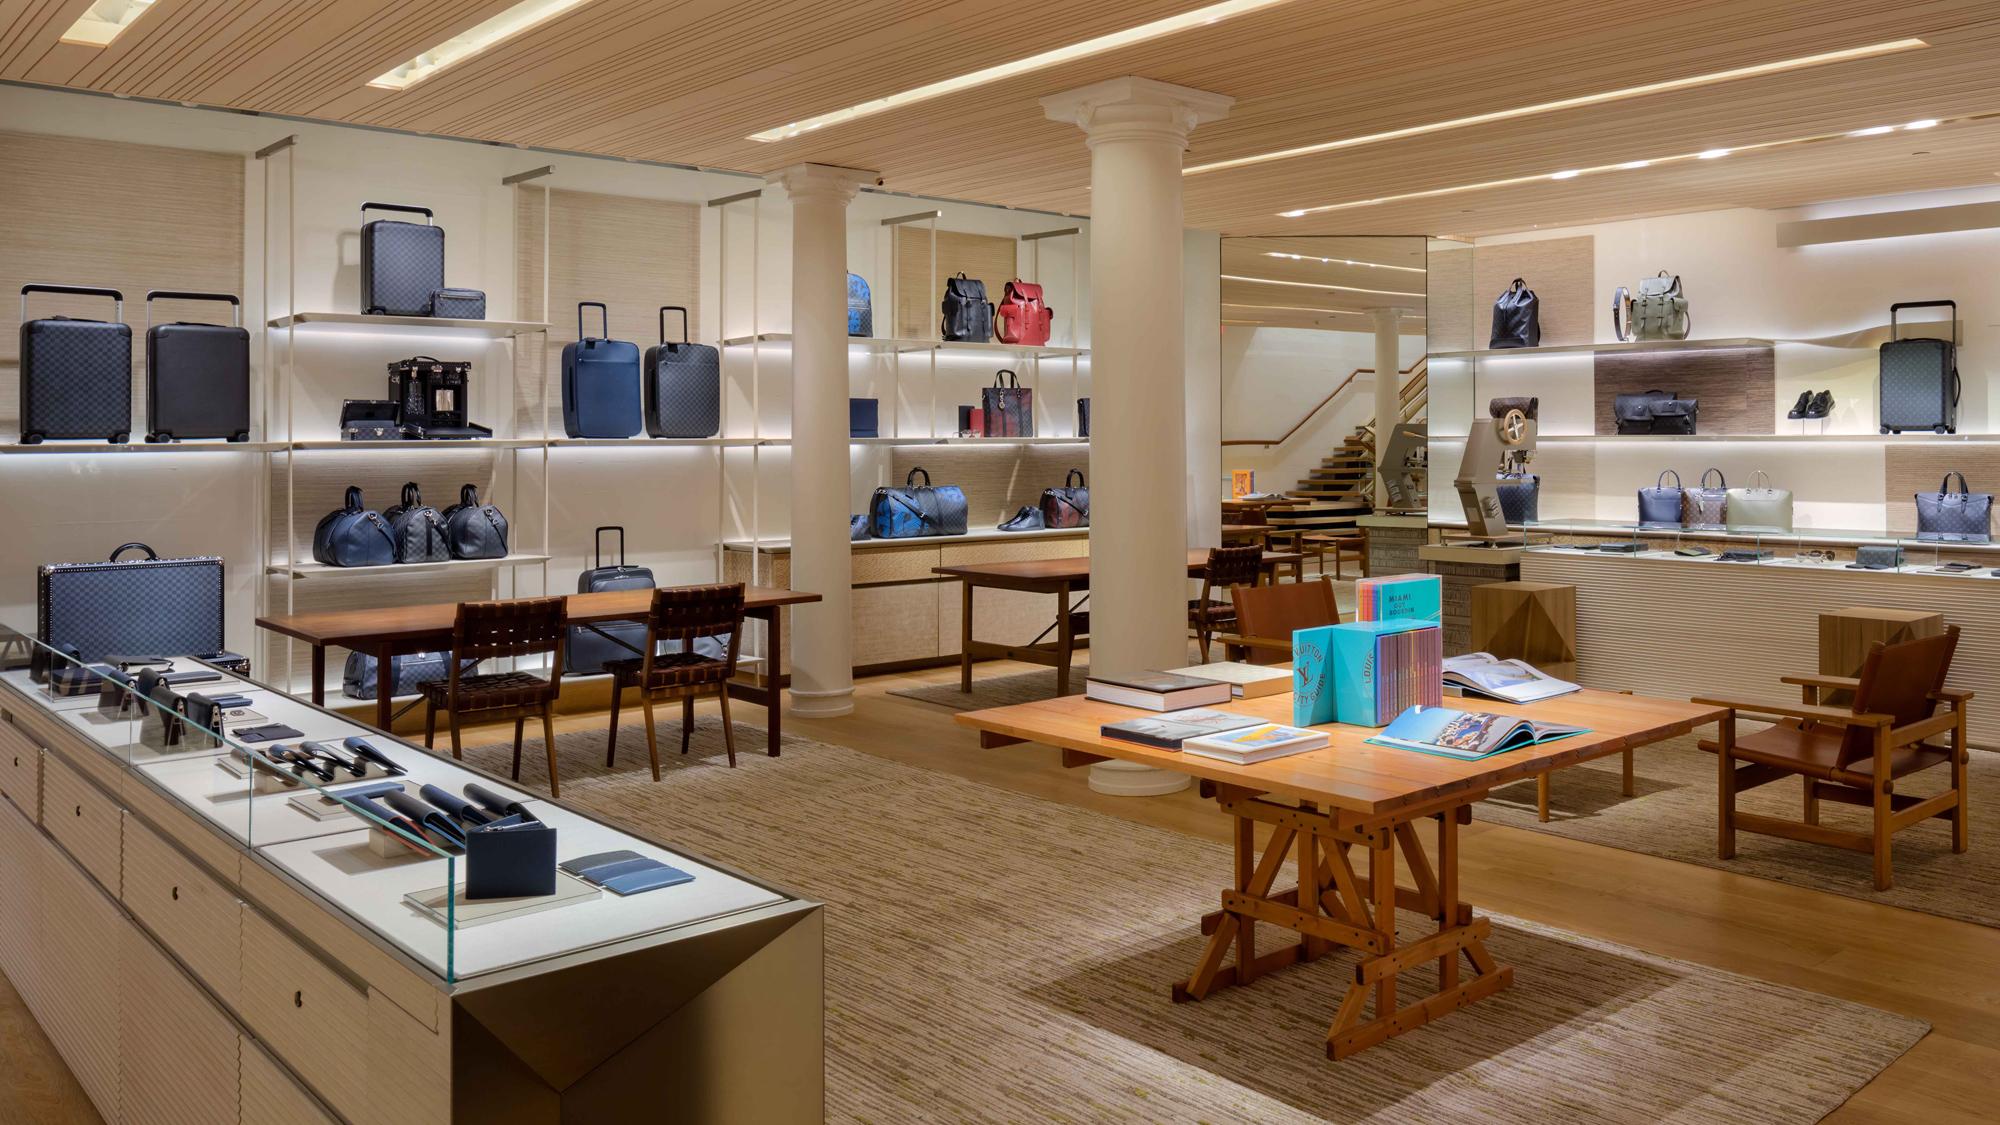 Louis Vuitton New York SoHo image 2